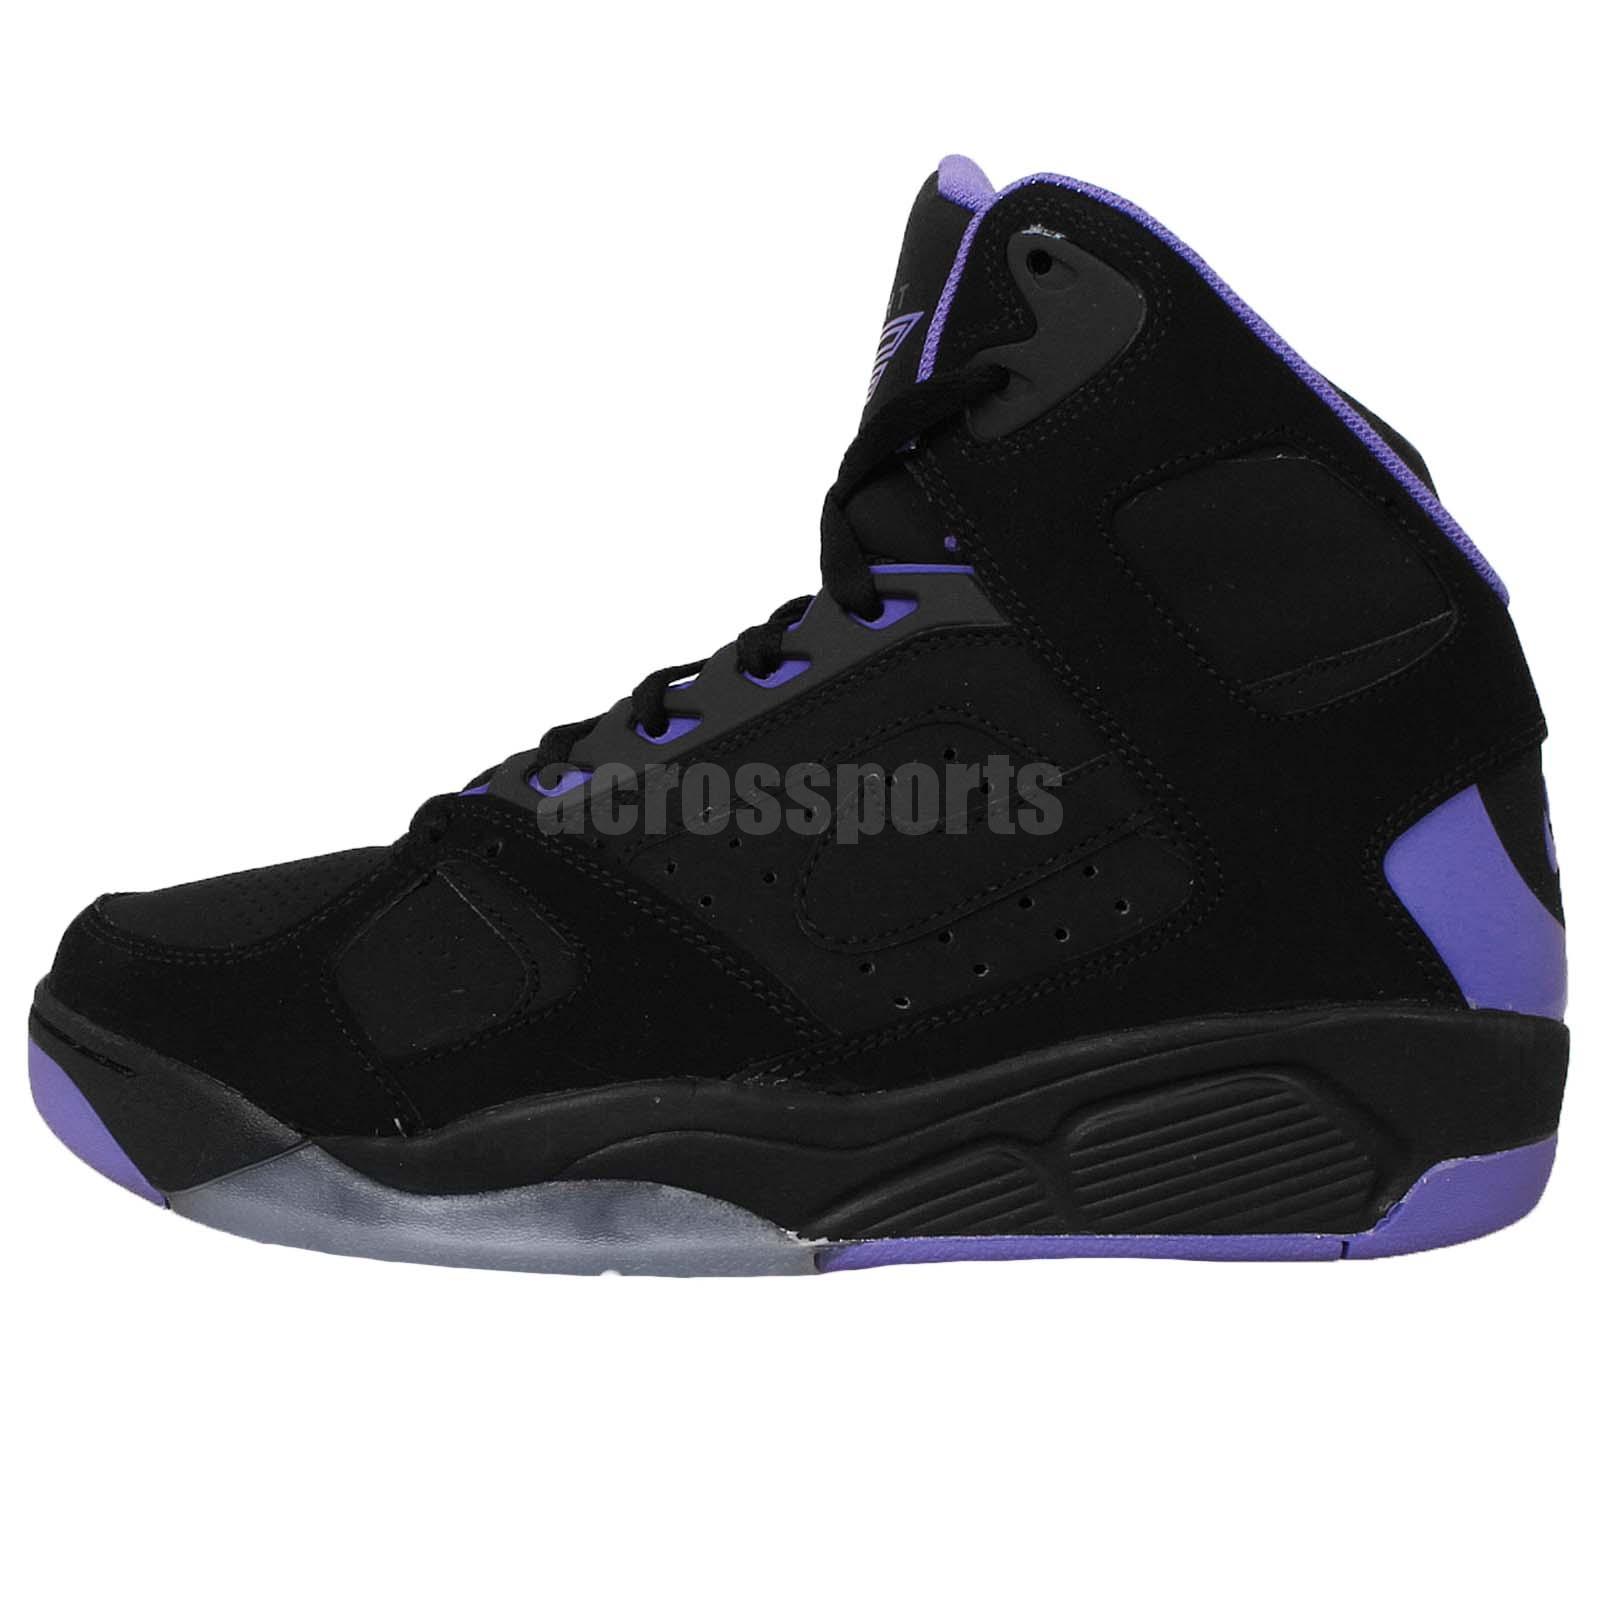 nike air flight lite high black purple 2015 retro basketball shoes sneakers ebay. Black Bedroom Furniture Sets. Home Design Ideas